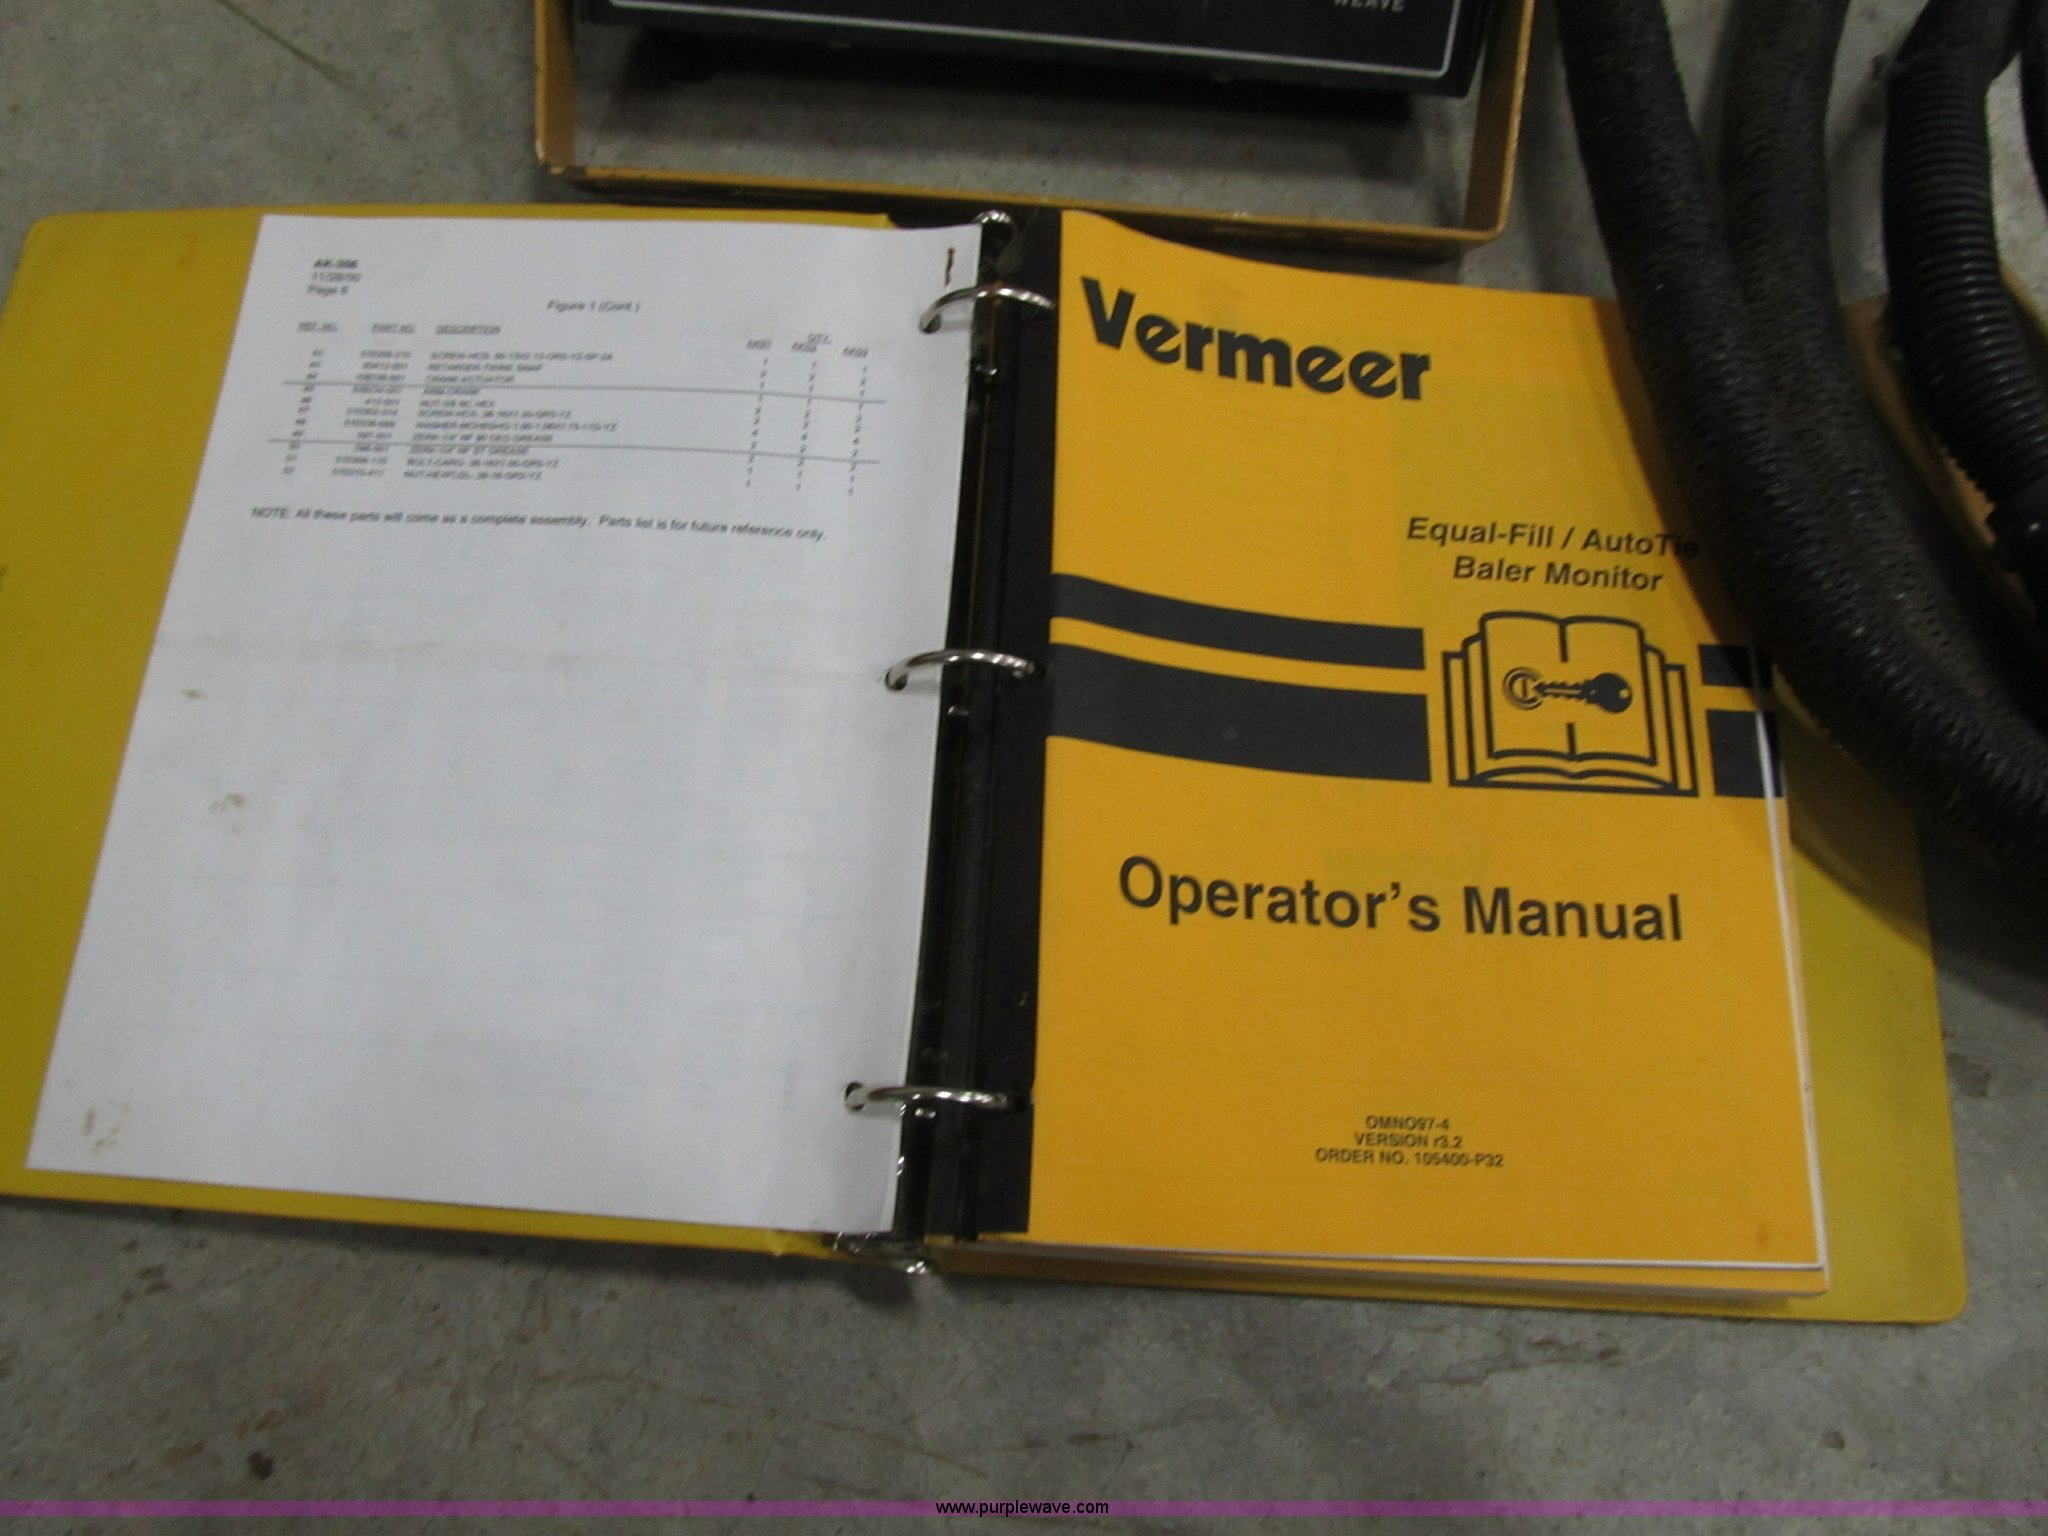 Vermeer Wiring Diagram - Today Wiring Schematic Diagram on